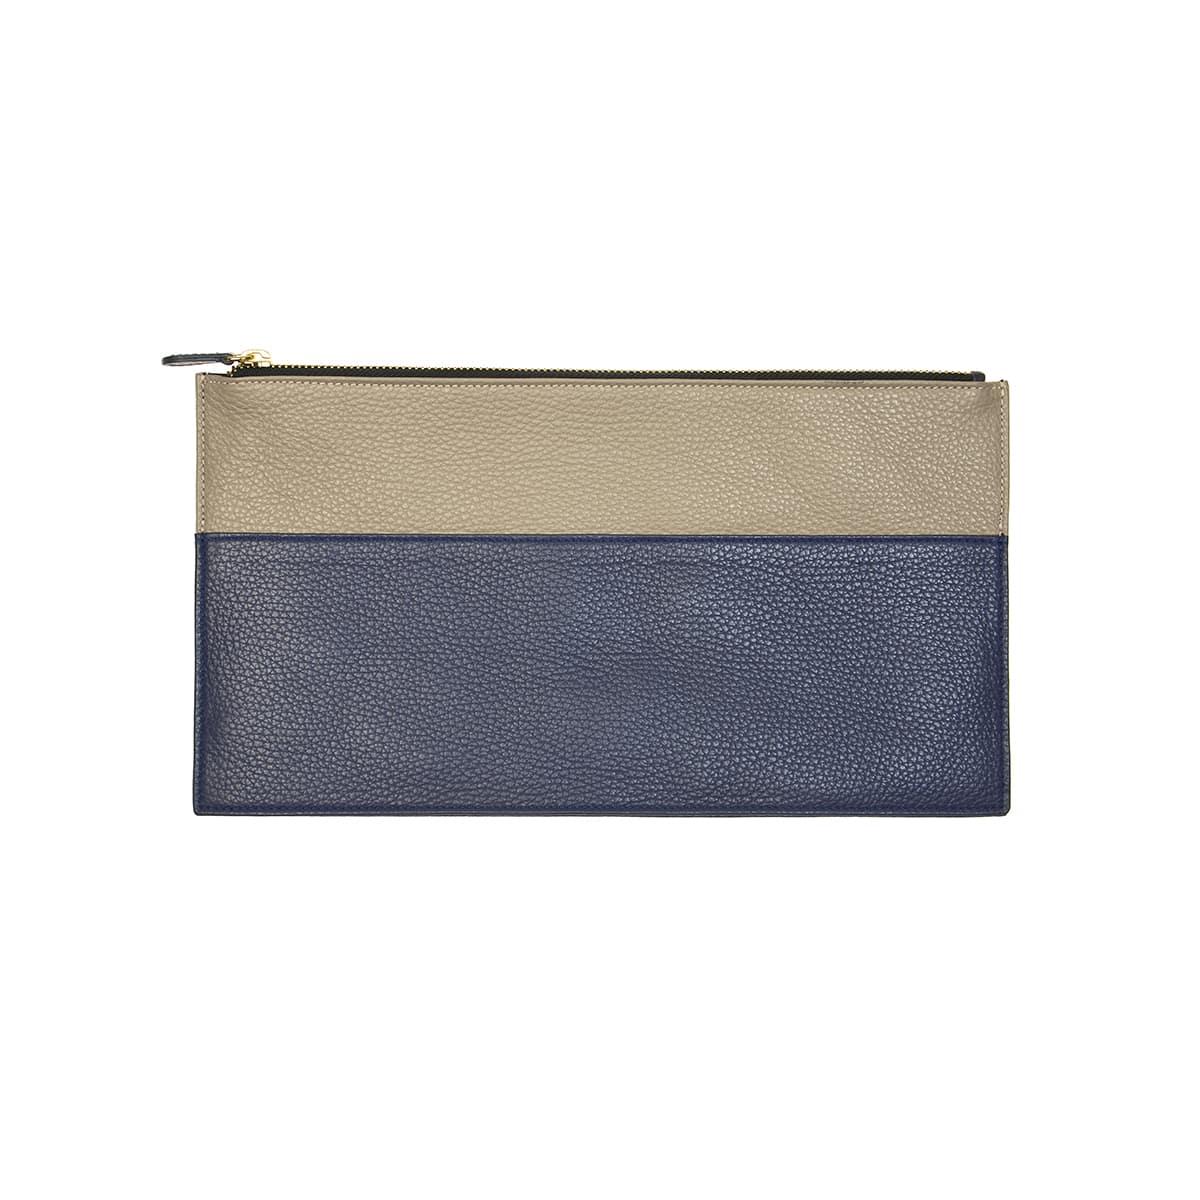 pochette plate handmade bleu taupe cuir CORALIE DE SEYNES - L'Erudite Concept Store